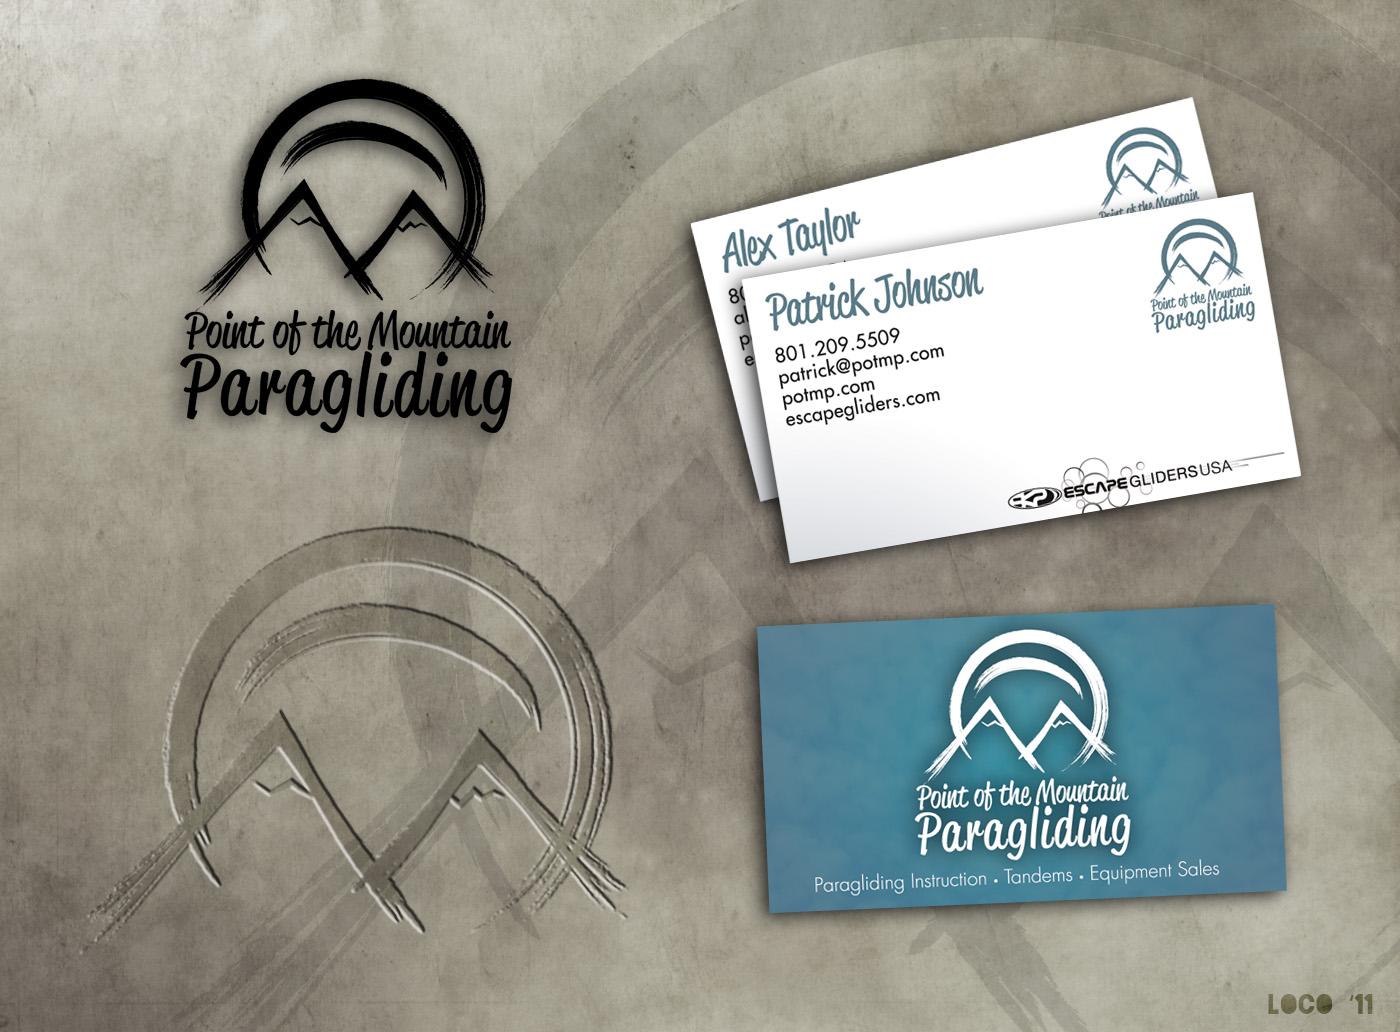 POTMP Logo treatment sheed.jpg